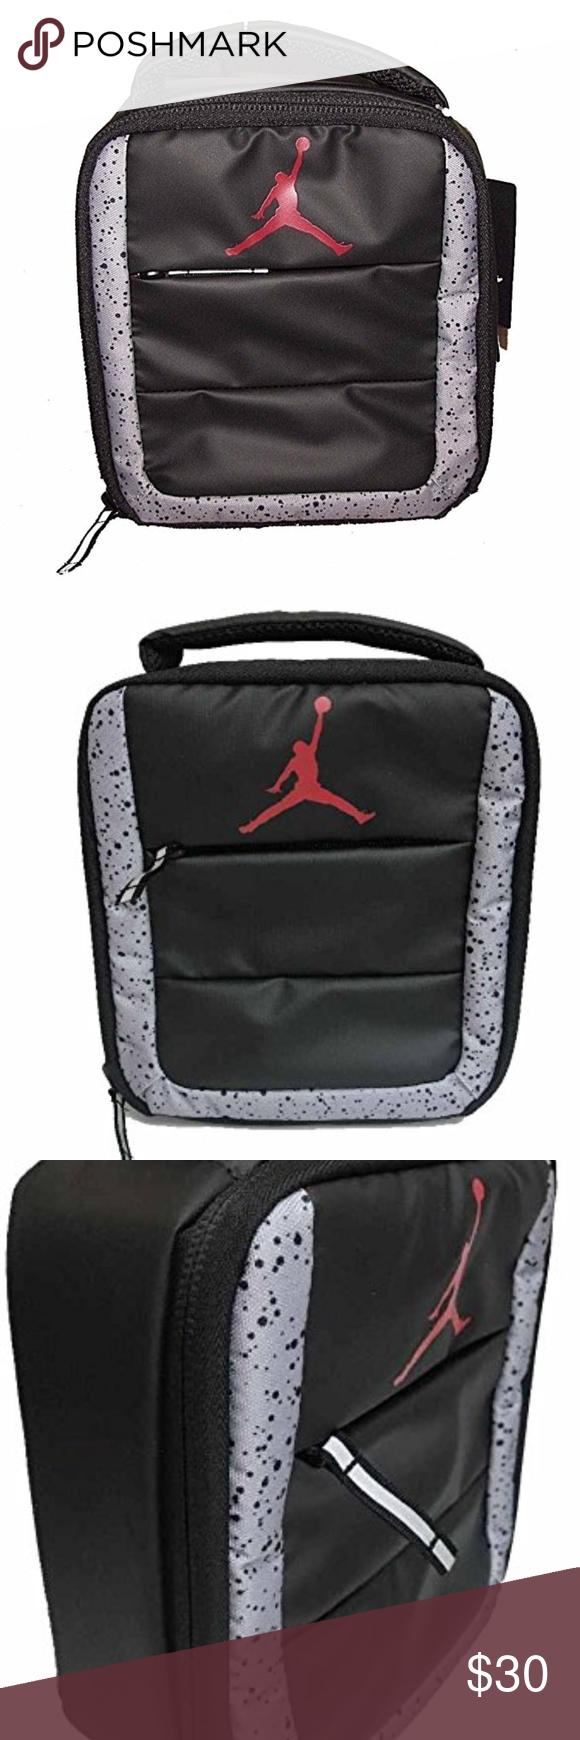 ce794df8edaea9 Jordan Lunch Box Tote Bag Nike Air Jordan insulated lunch tote. Jumpman  logo on front